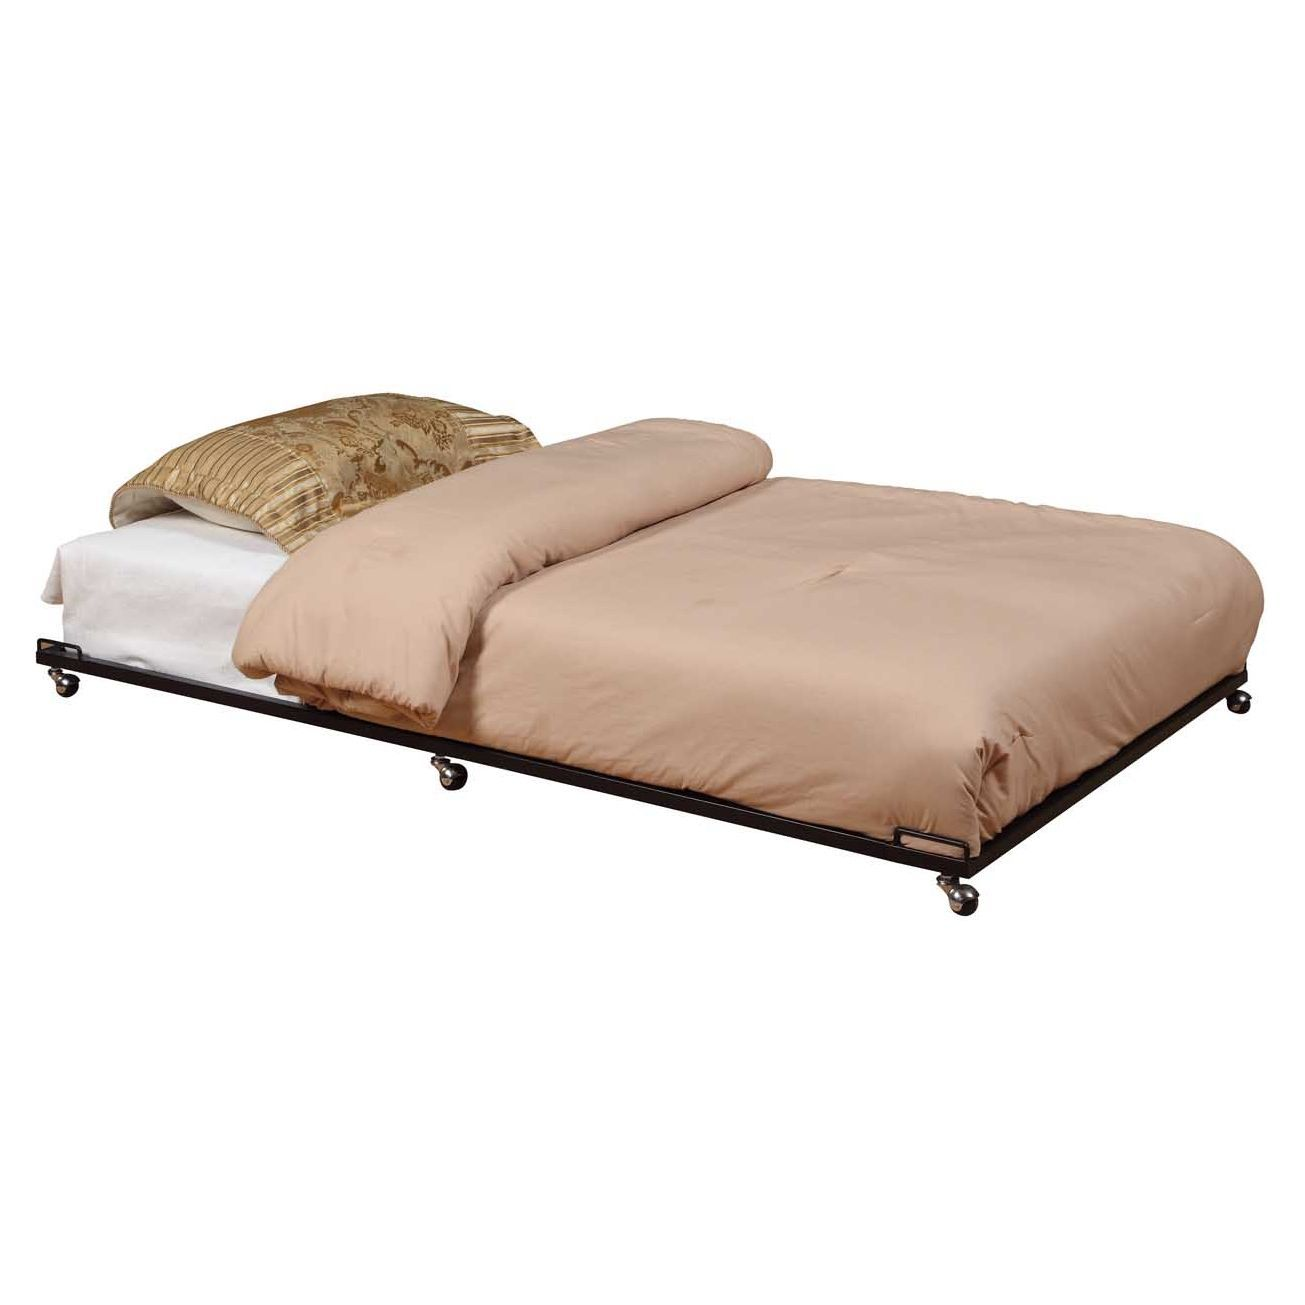 k b black trundle bed easy storage black metal and construction